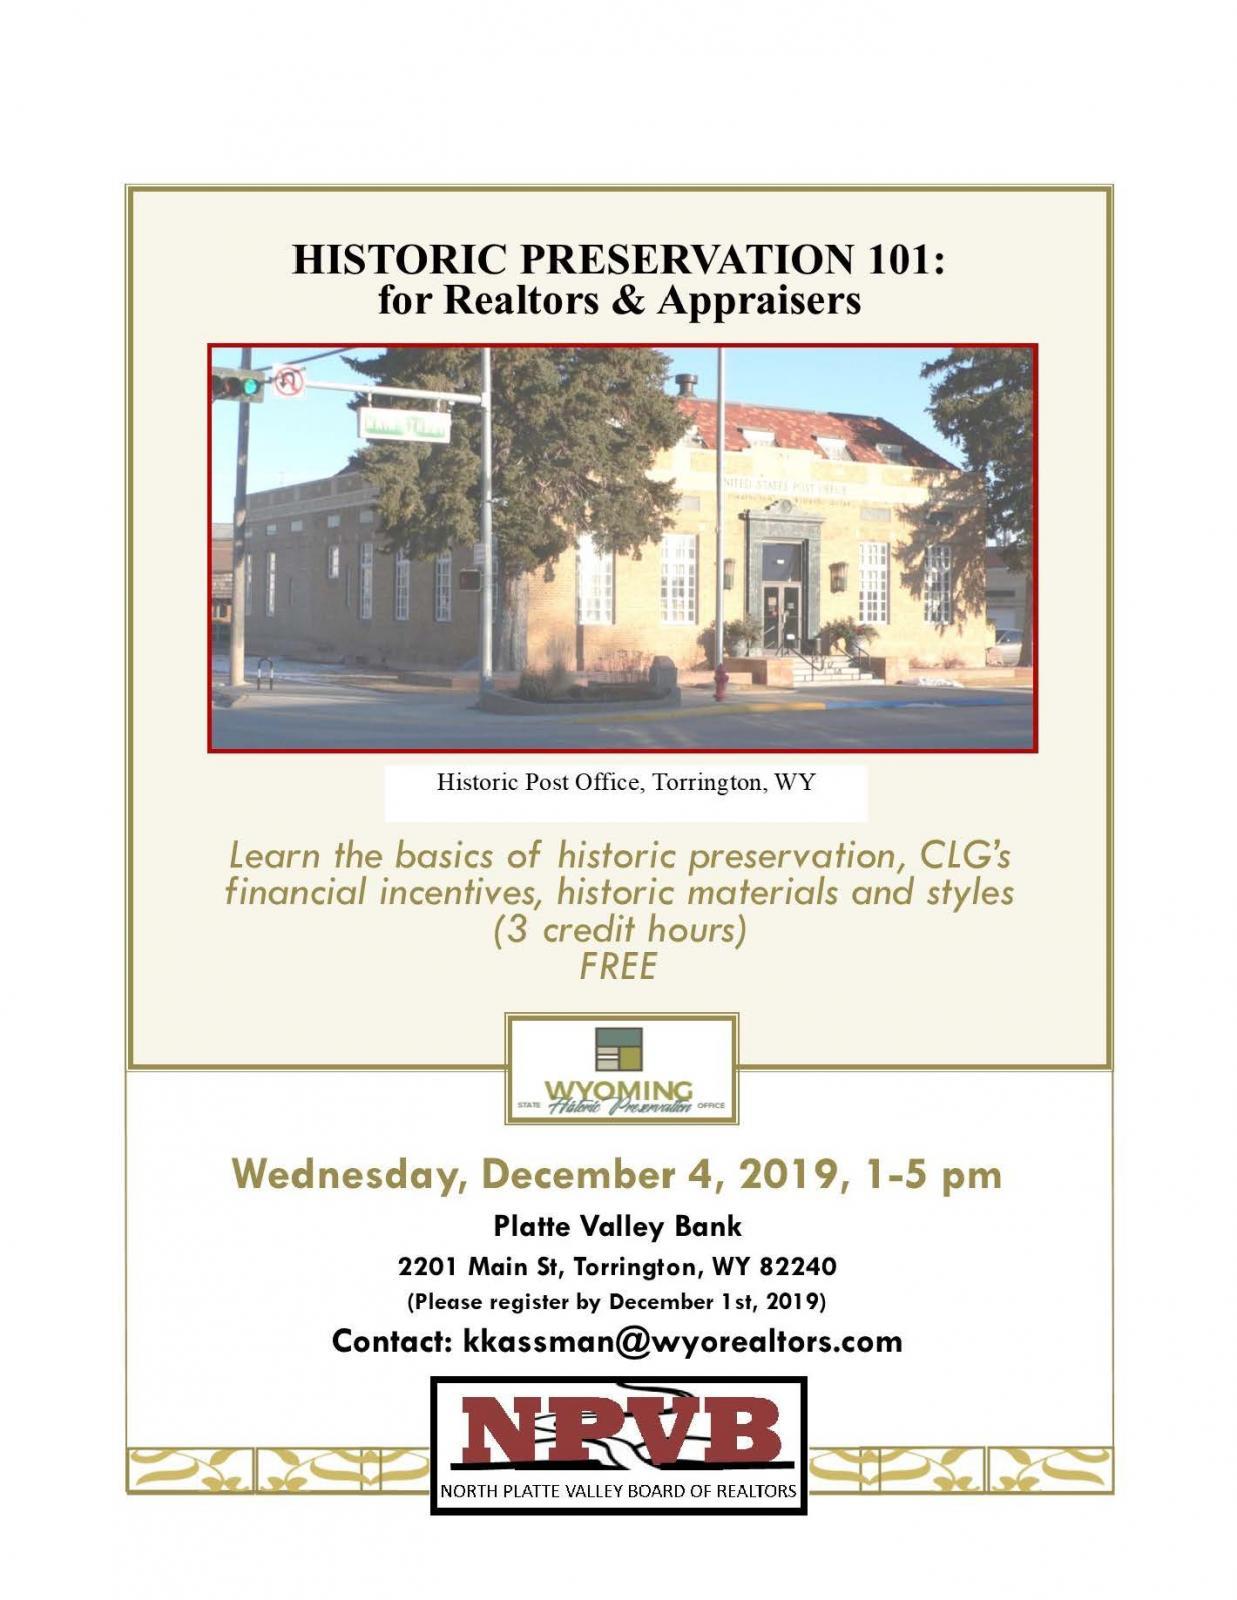 Historic Preservation 101: for Realtors & Appraisers Photo